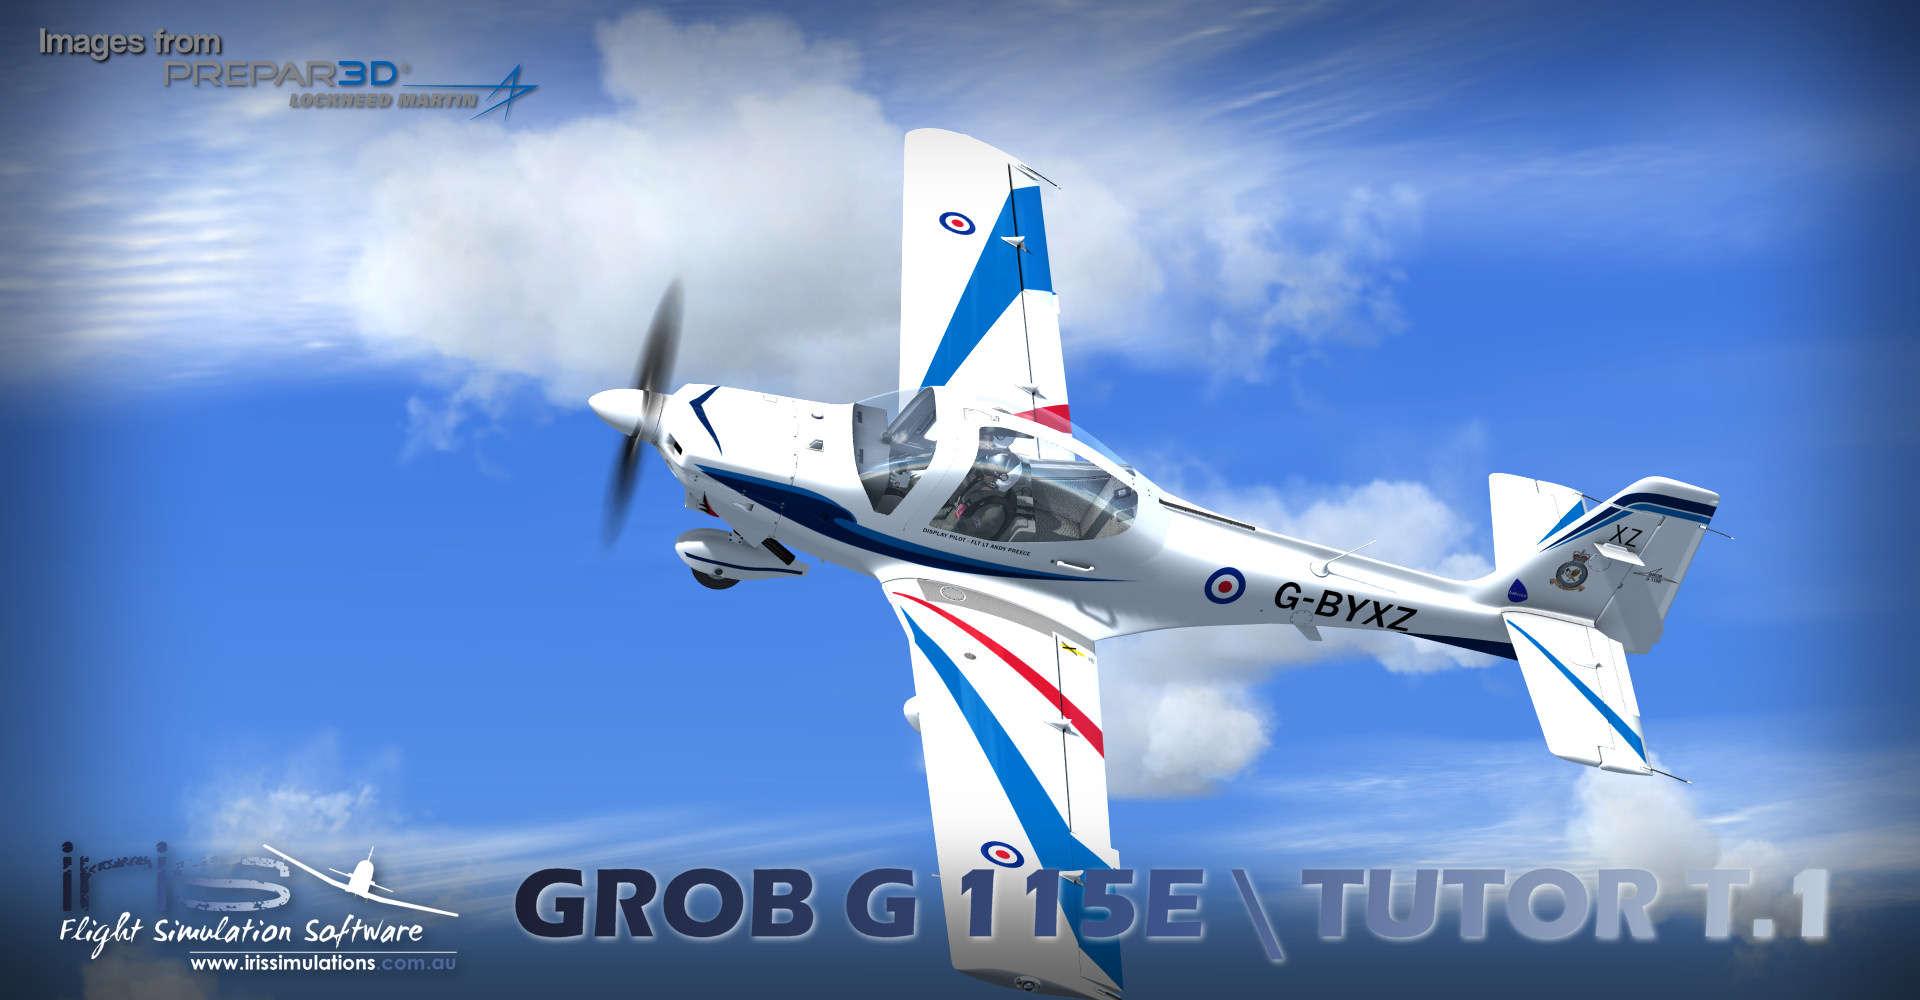 Just Flight - IRIS - Pro Training Series – Grob G115E